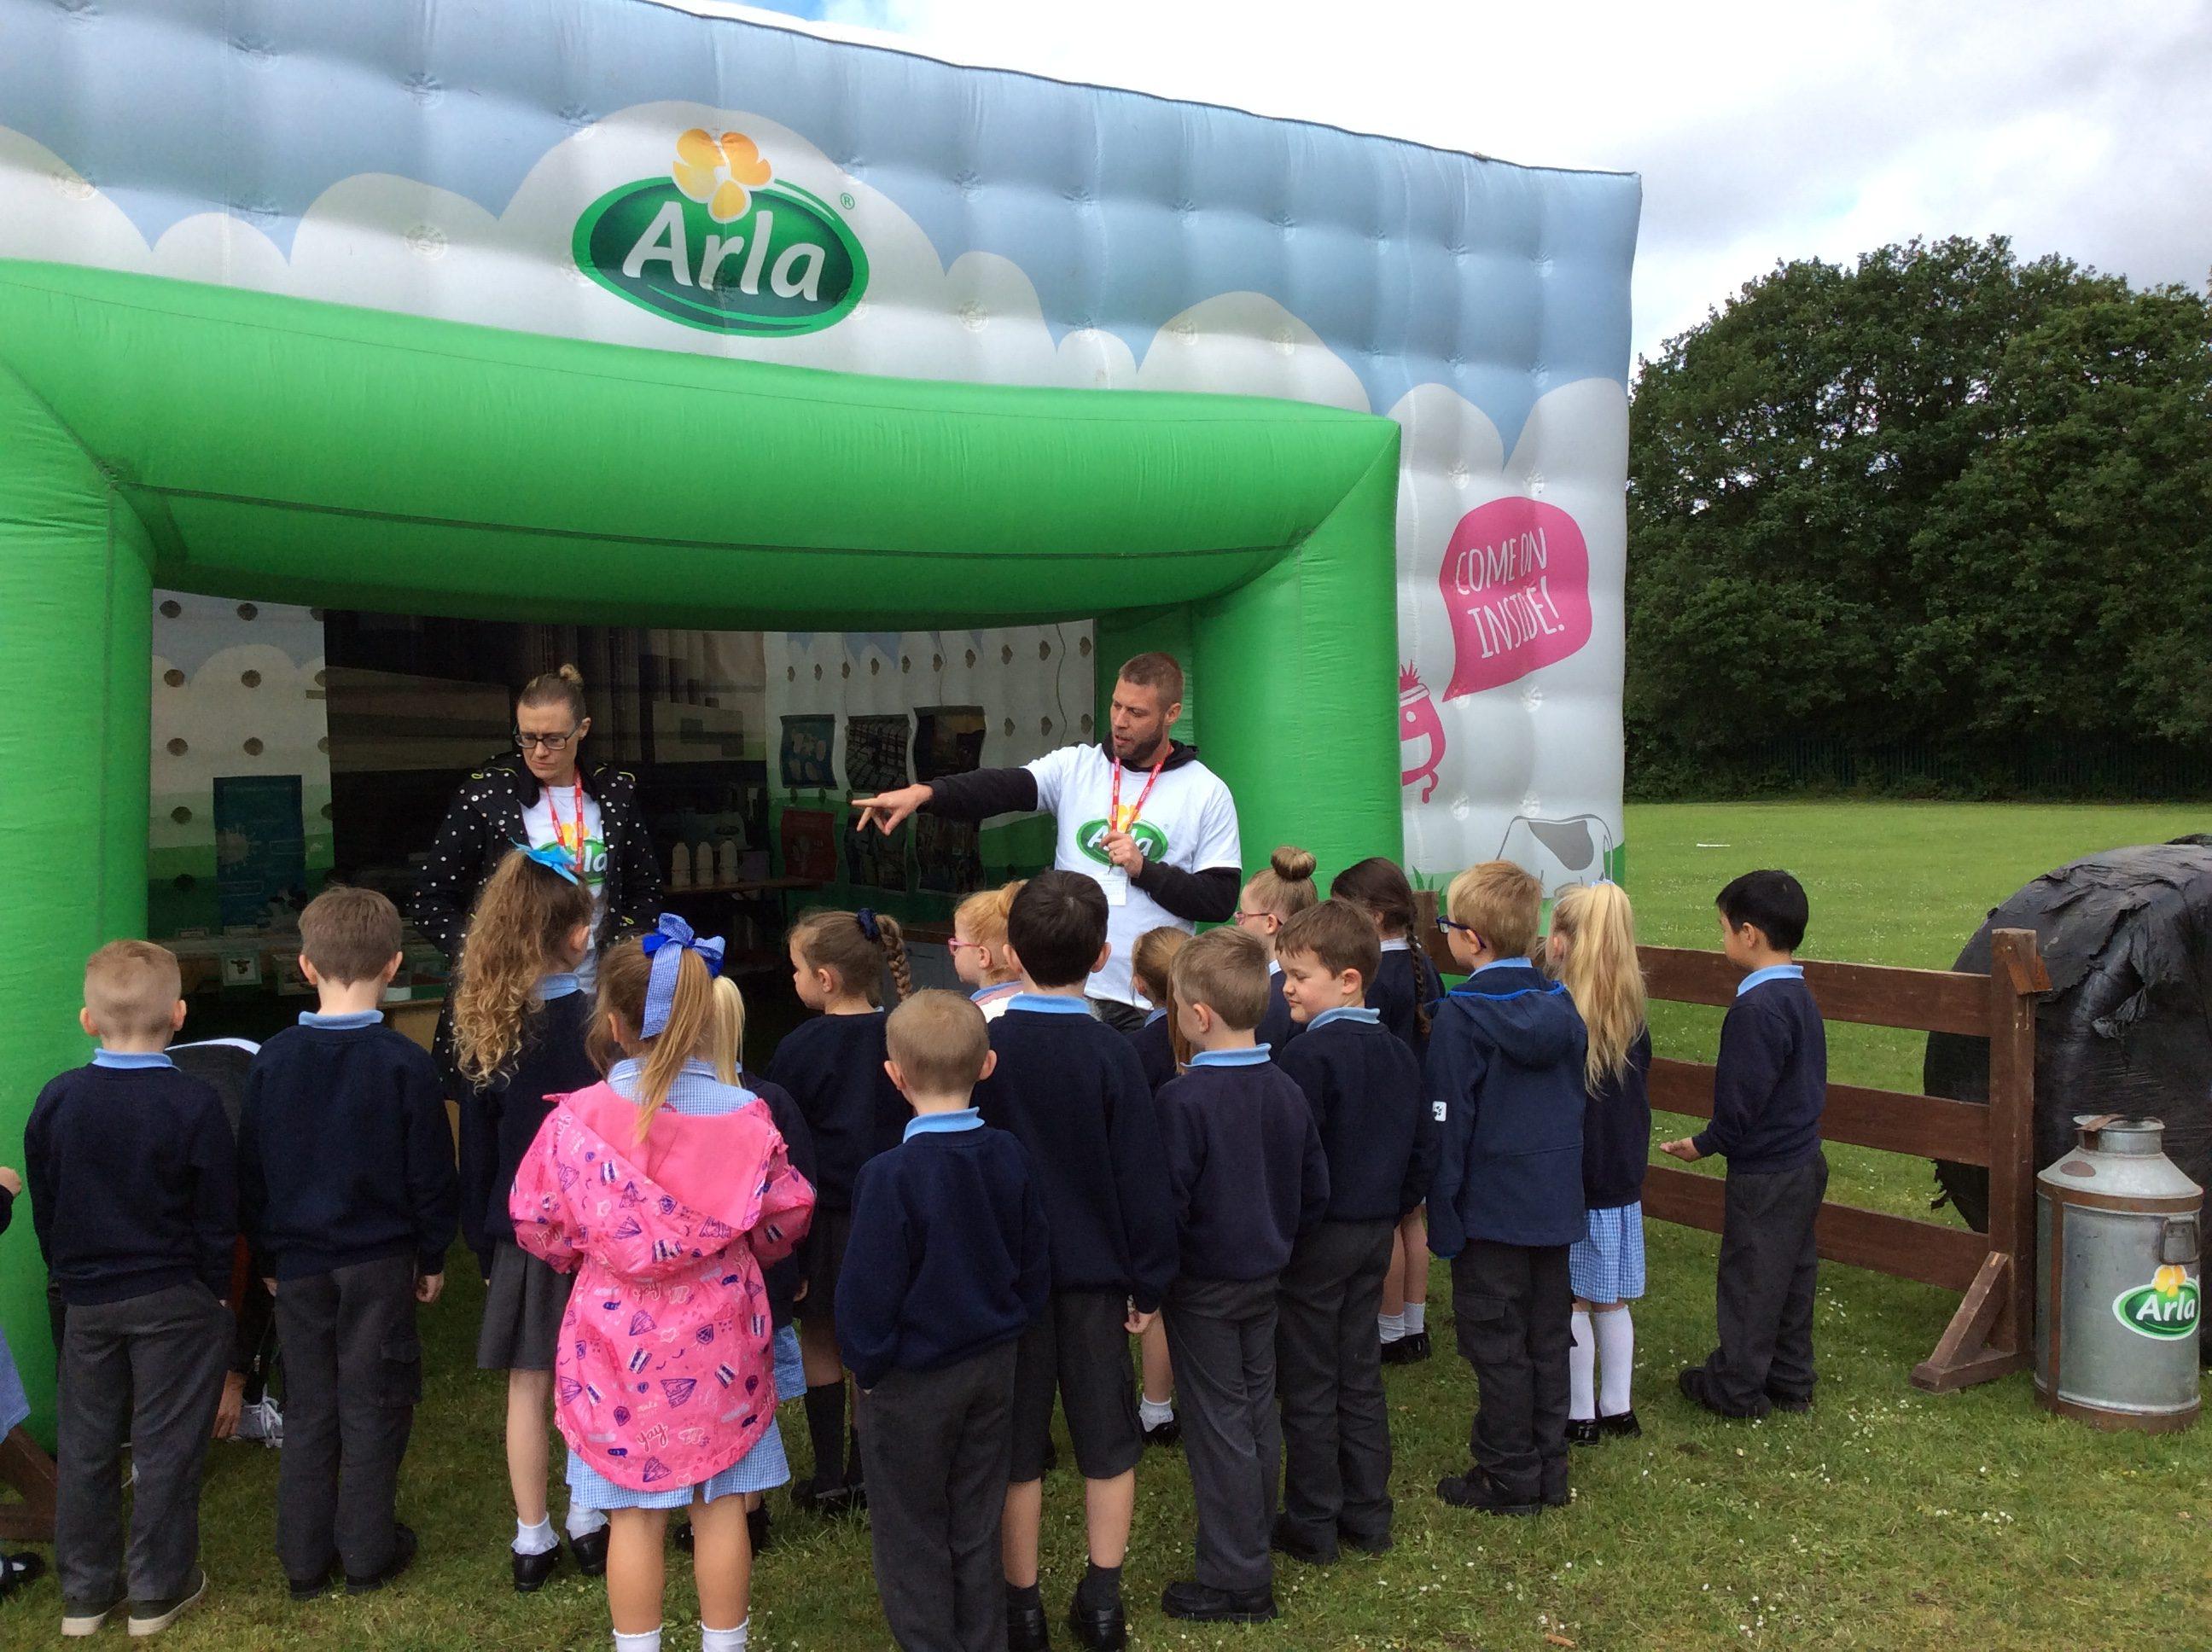 Arla Milk Education Day